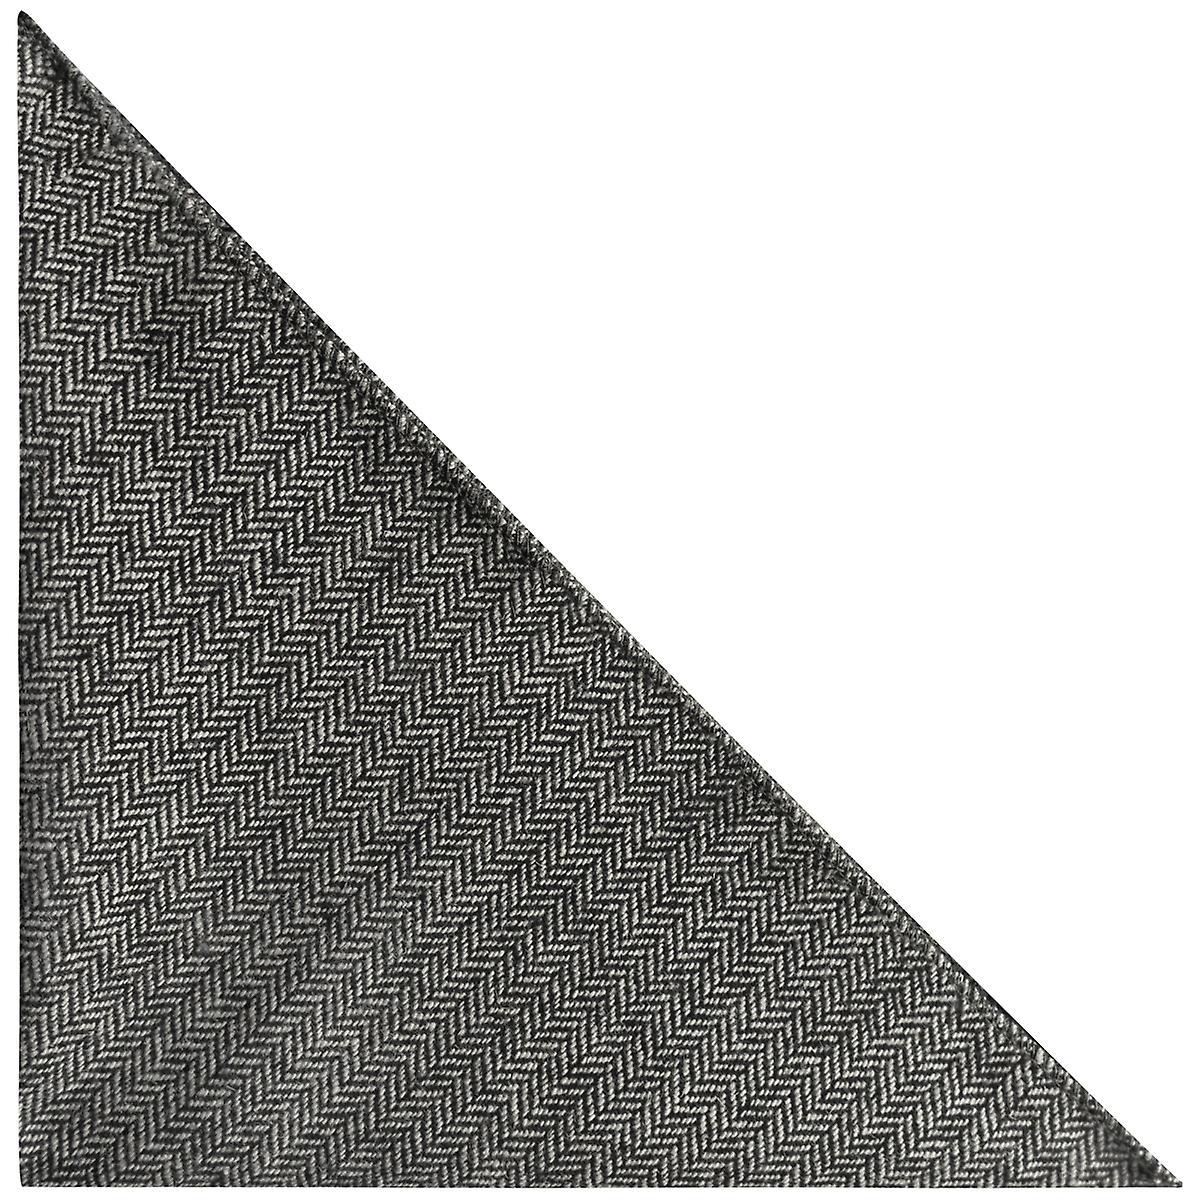 Black Herringbone Pocket Square, Handkerchief, Charcoal Grey